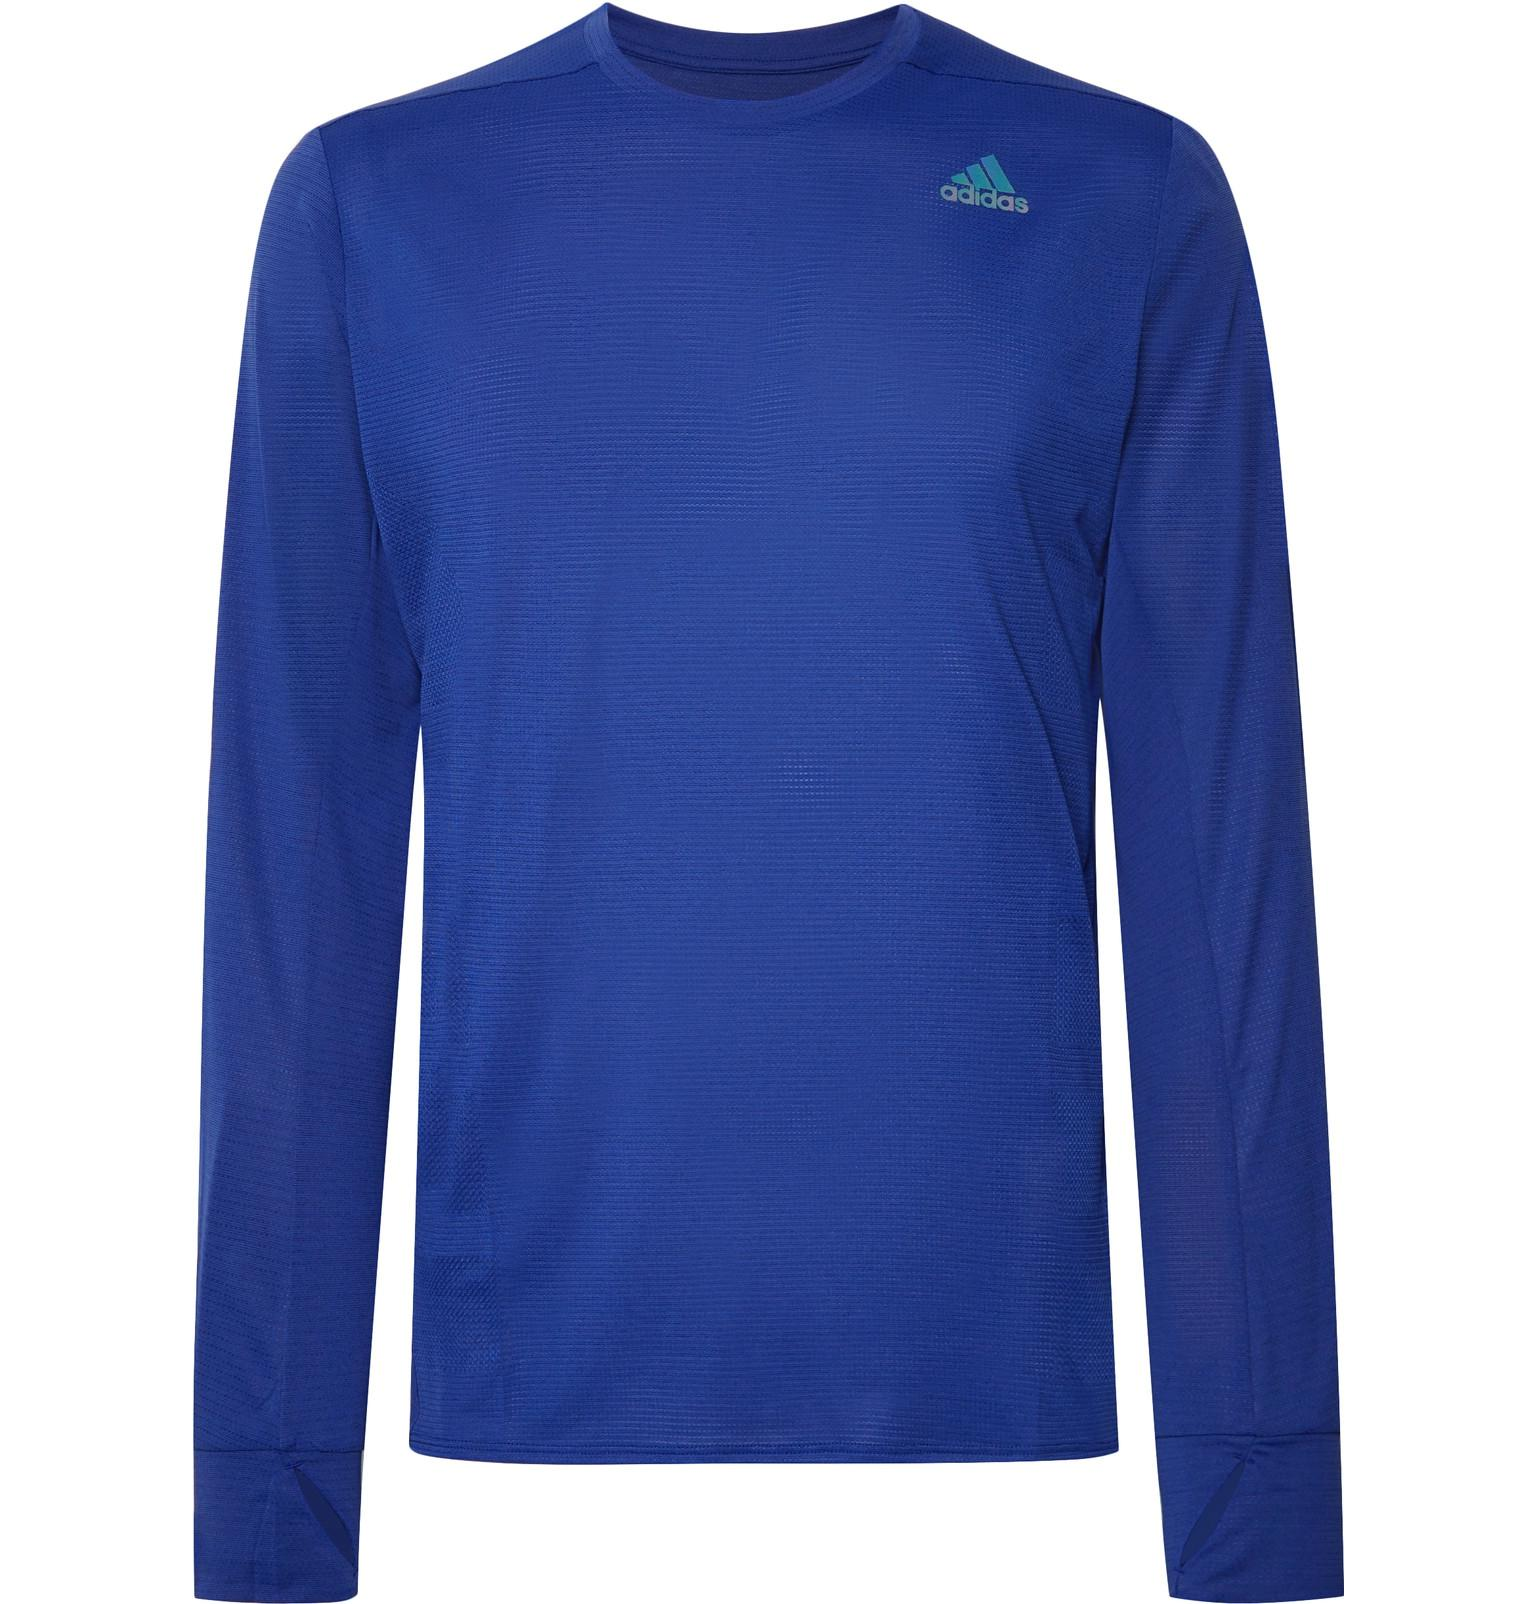 Lyst - Adidas Originals Supernova Climacool T-shirt in Blue for Men f2a2101f5